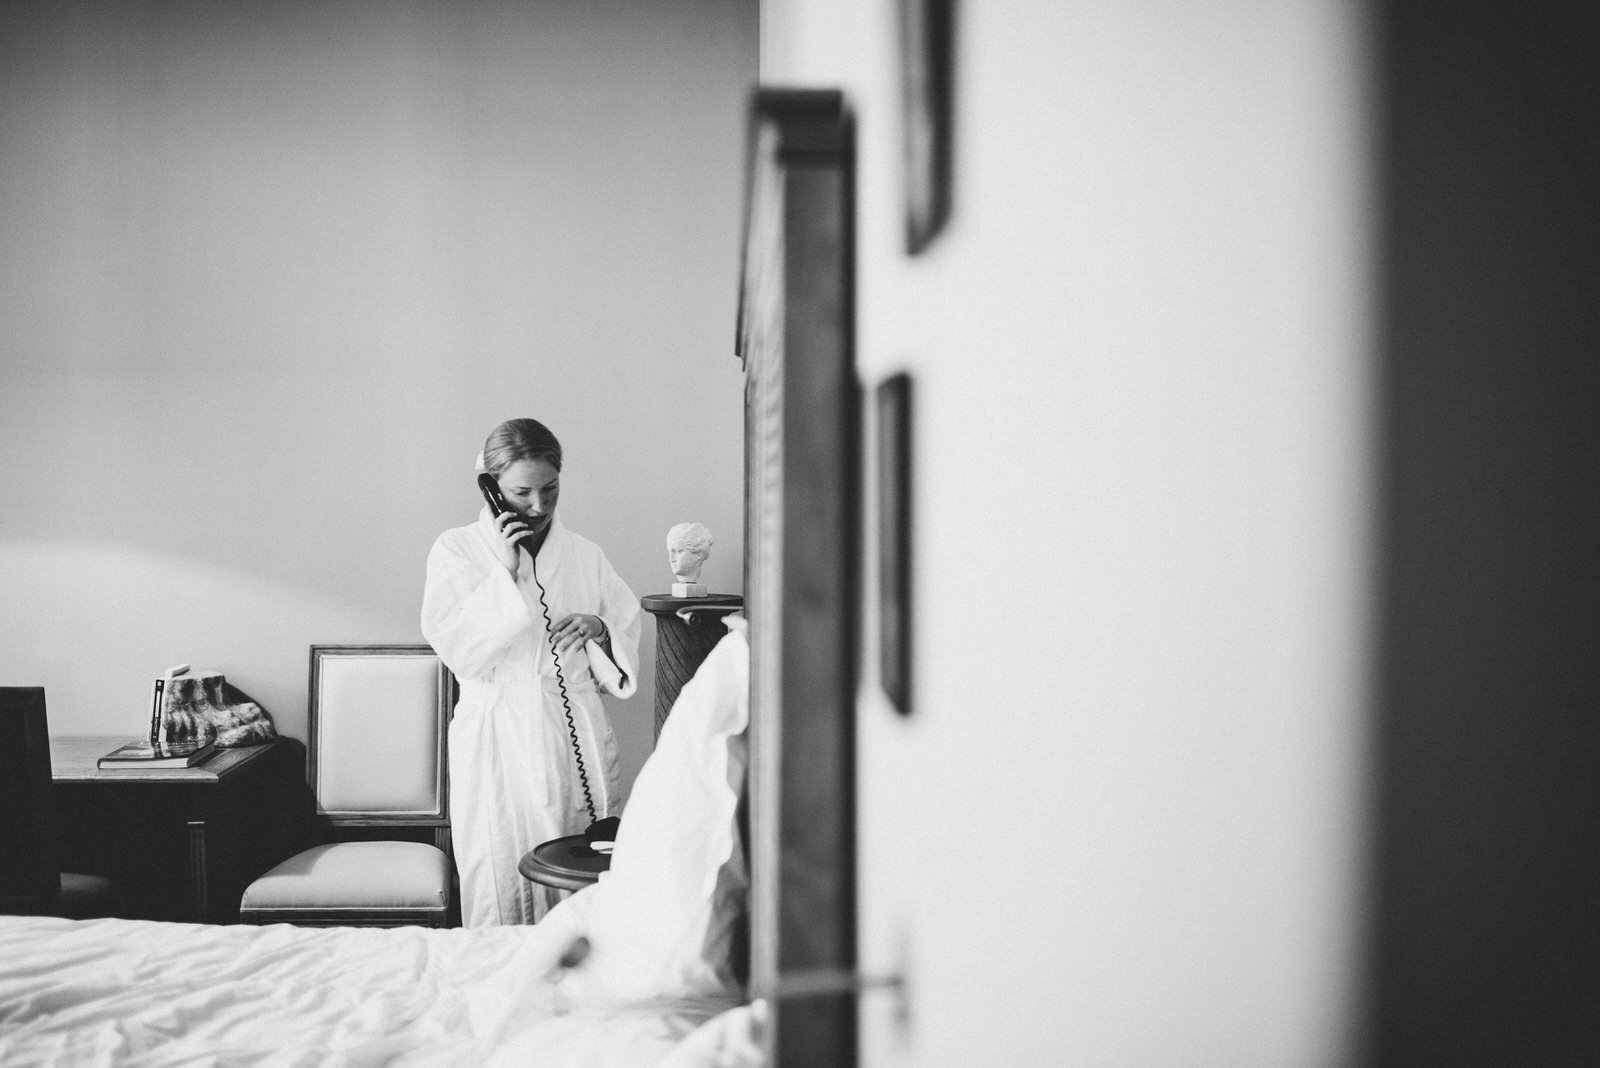 004-LOURMARIN-WEDDING-PHOTOGRAPHER-PROVENCE-WEDDING-ALTERNATIVE-WEDDING-PHOTOGRAPHY-FRANCE-PROVENCE-GARDEN-WEDDING.JPG